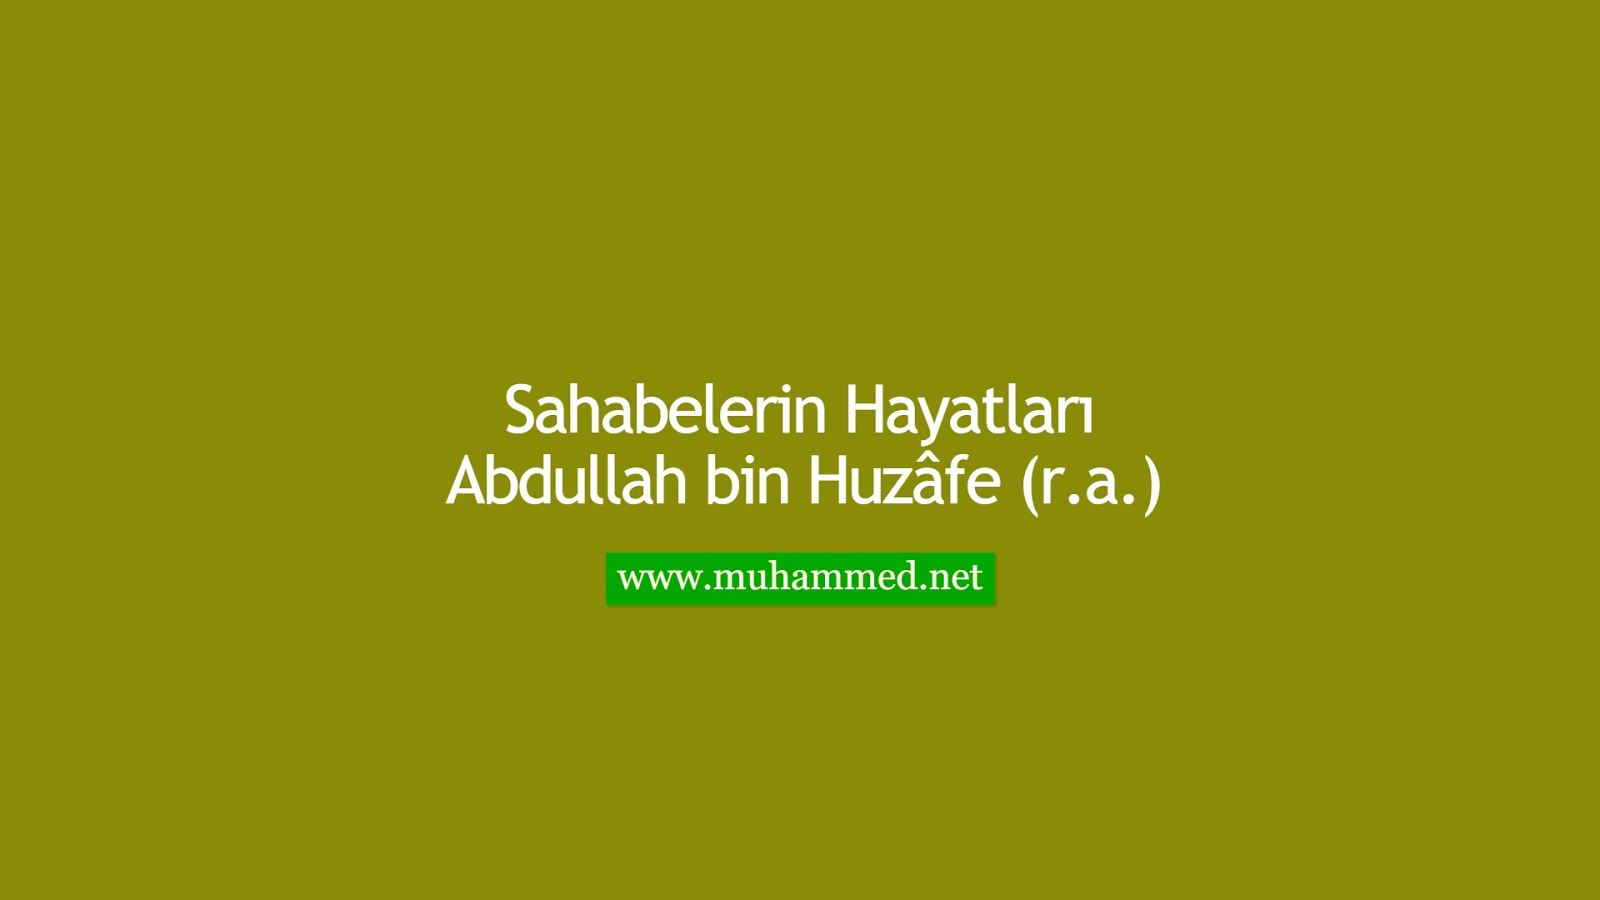 Abdullah bin Huzâfe (r.a.)